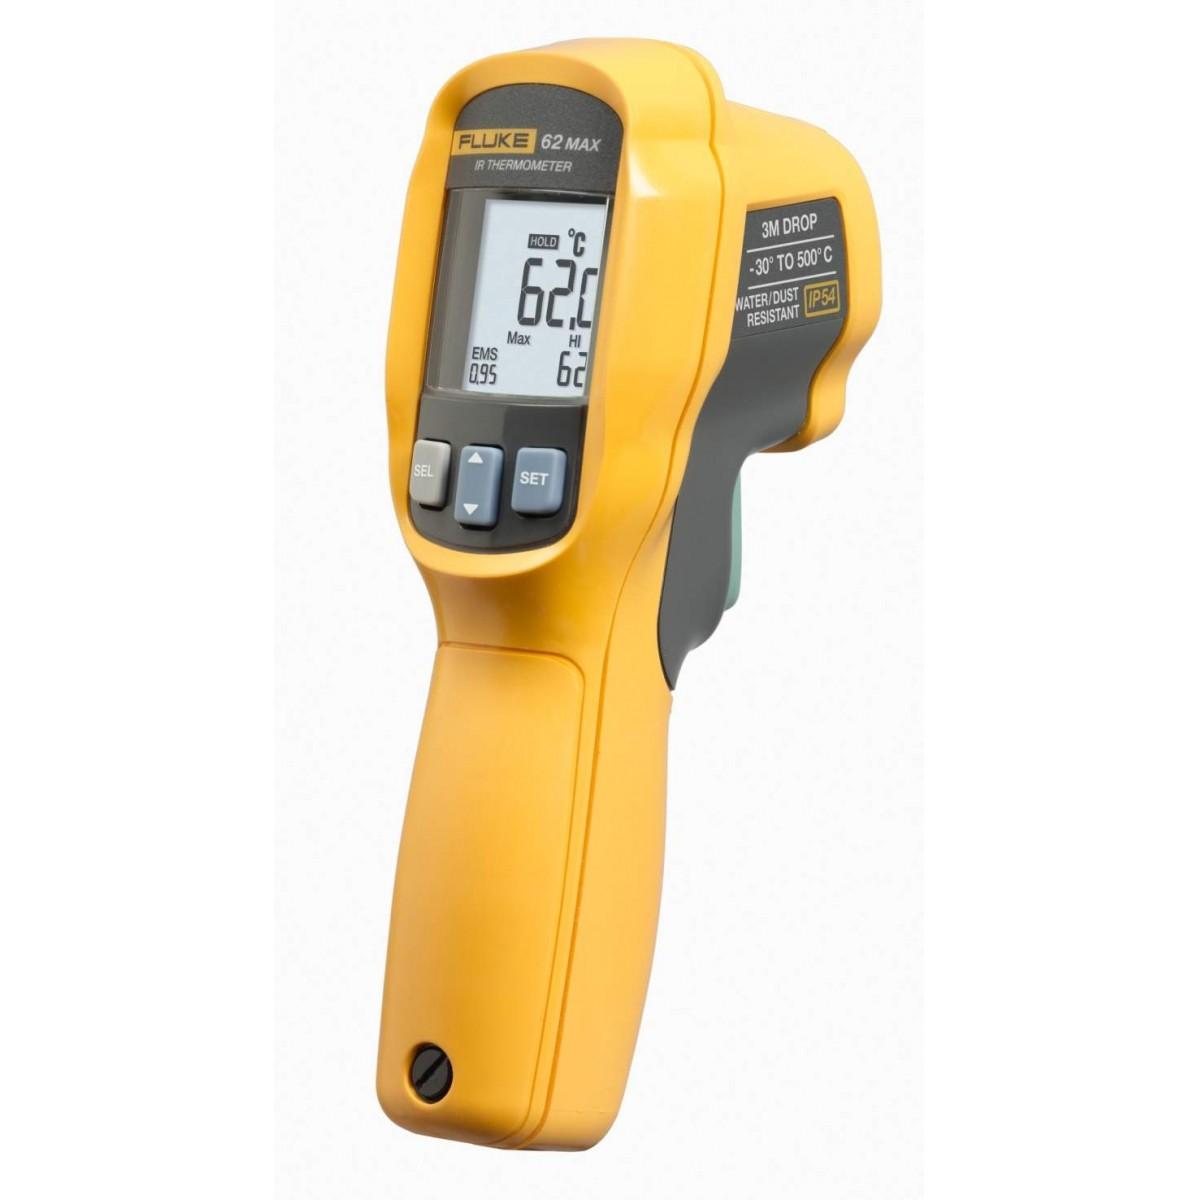 Fluke 62 MAX - Termômetros infravermelhos  -30 °C a 500 °C  - Rio Link